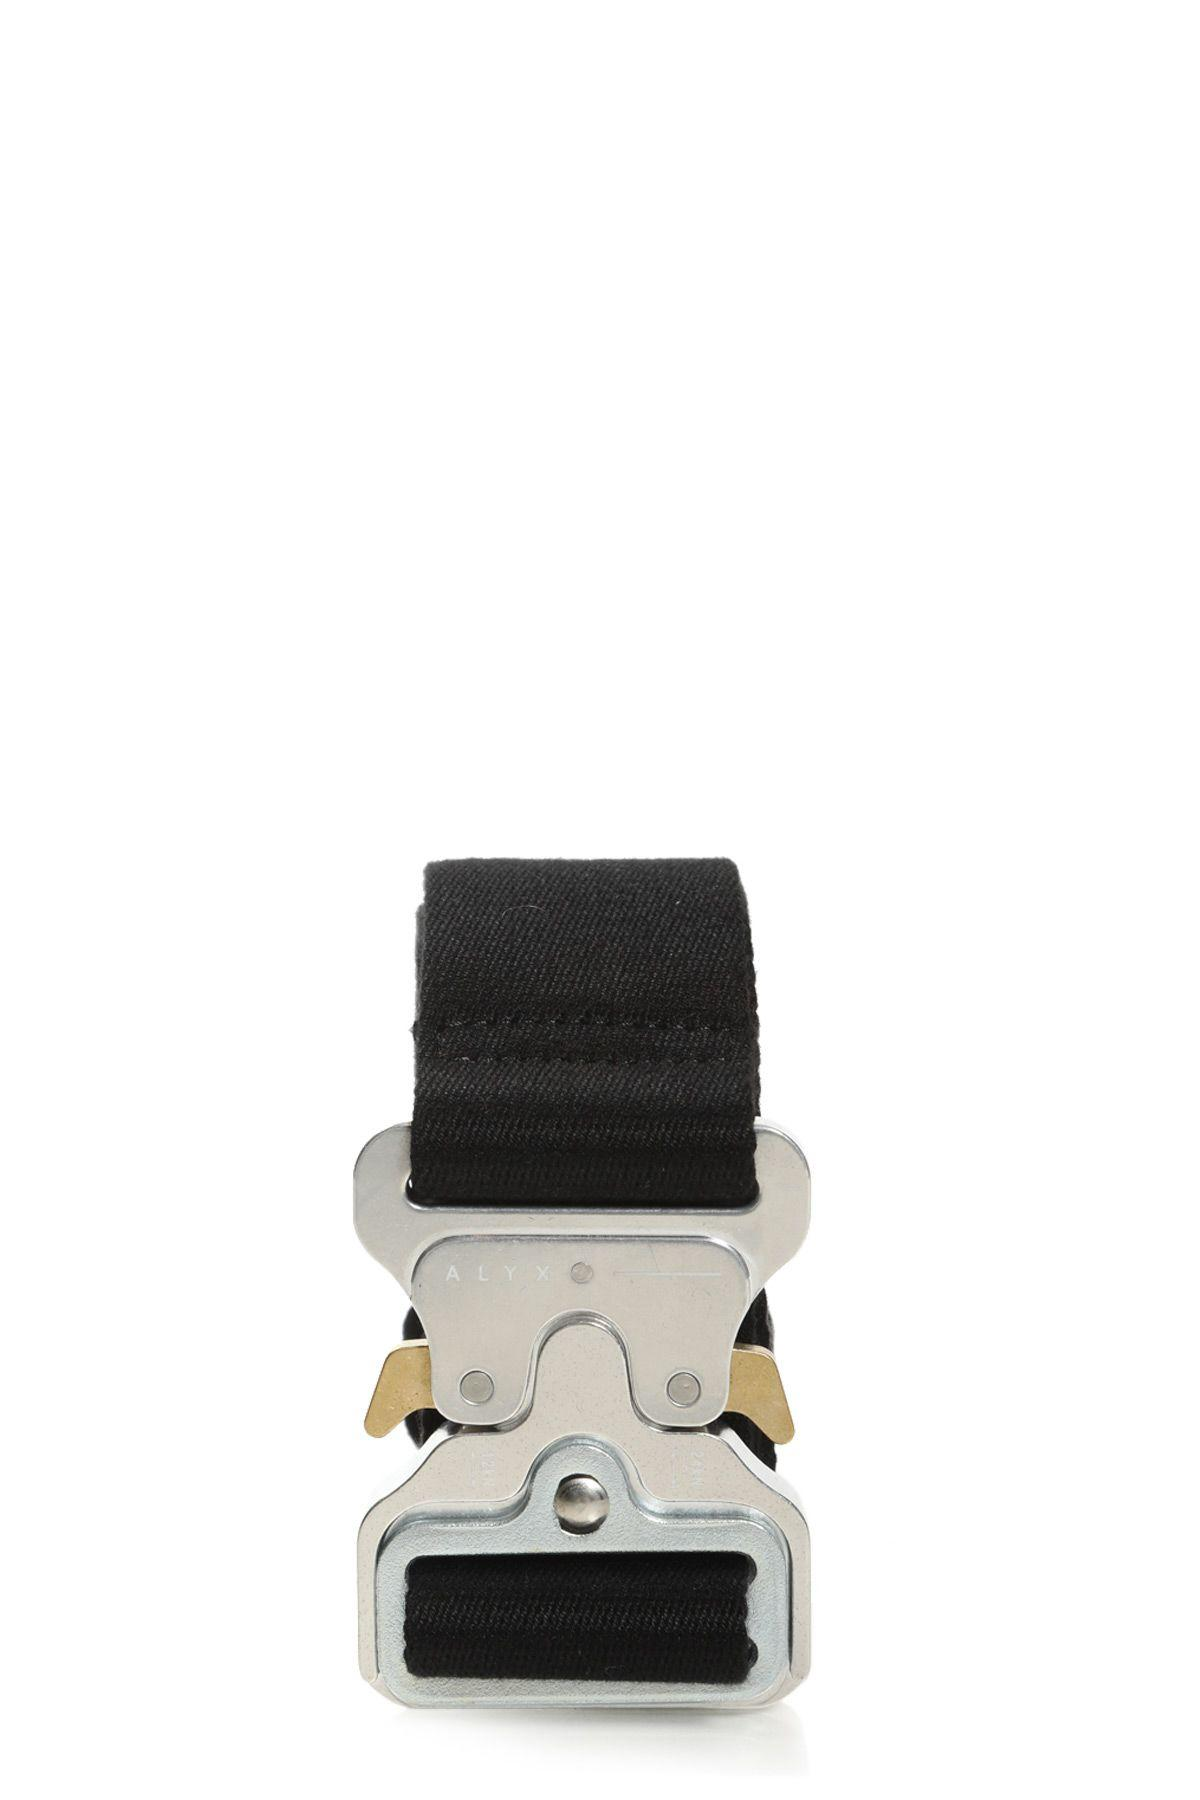 Alyx Aawbt0005b01 Rollercoaster Belt 1 In Nero-argento